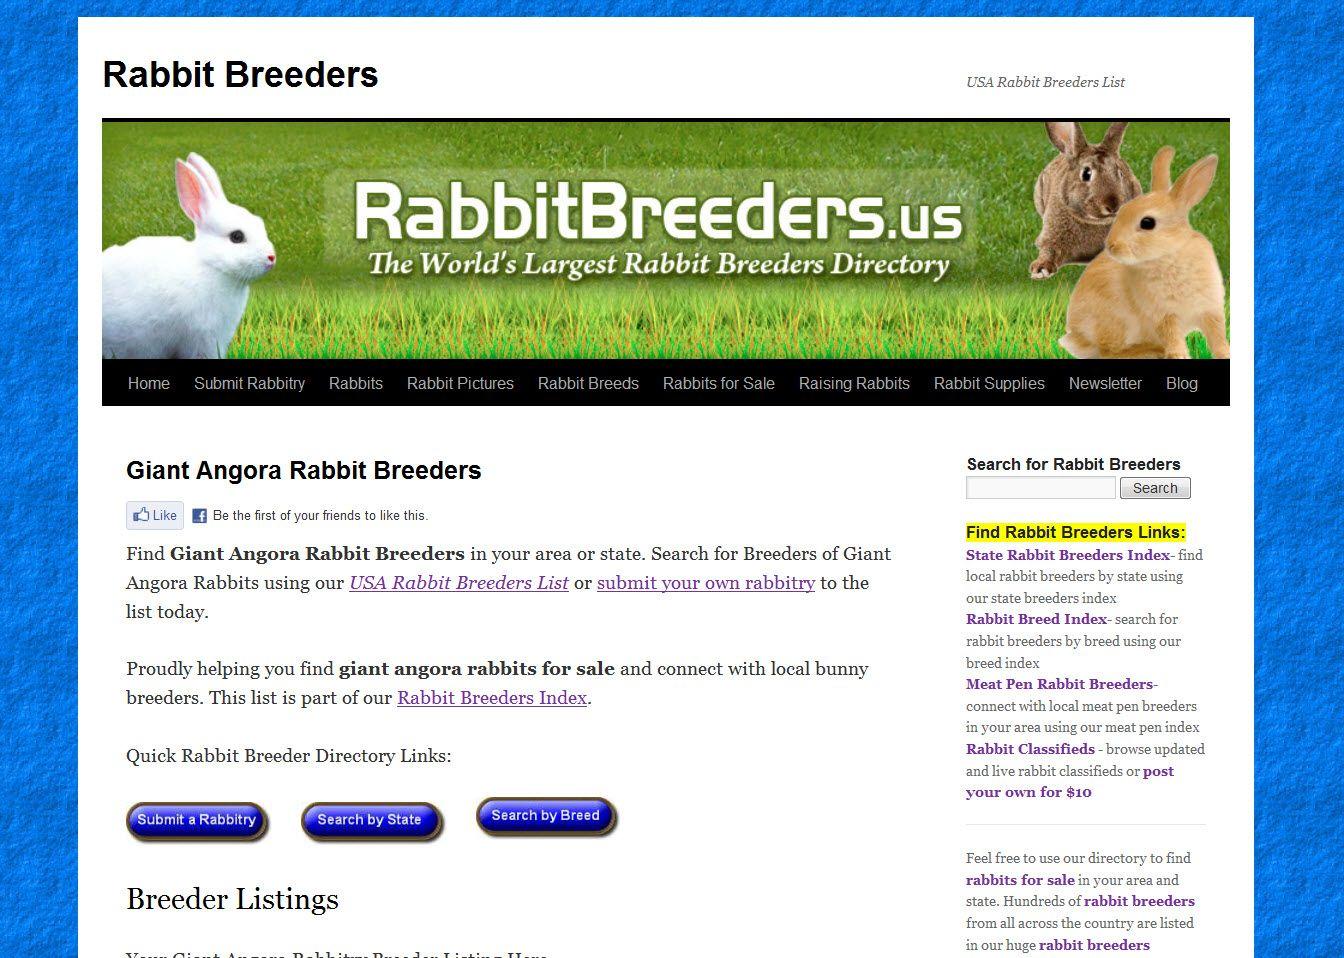 Find Giant Angora Rabbit Breeders in your area. Locate breeders of ...